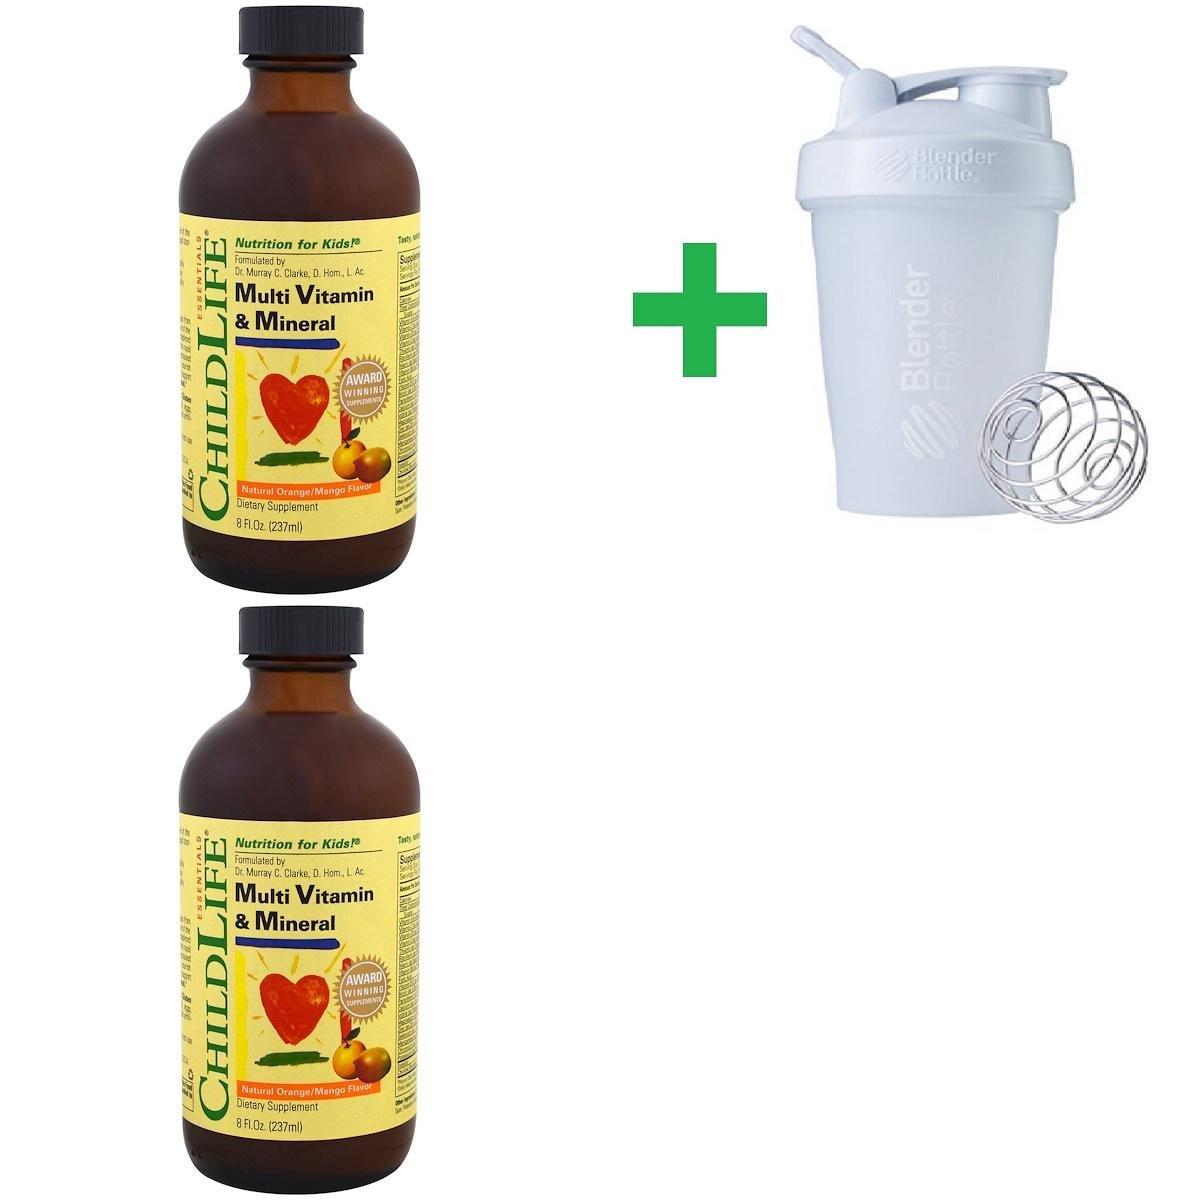 ChildLife, Essentials, Multi Vitamin & Mineral, Natural Orange/Mango Flavor, 8 fl oz (237 ml) (2 PACKS) + Assorted Sundesa, BlenderBottle, Classic With Loop, 20 oz